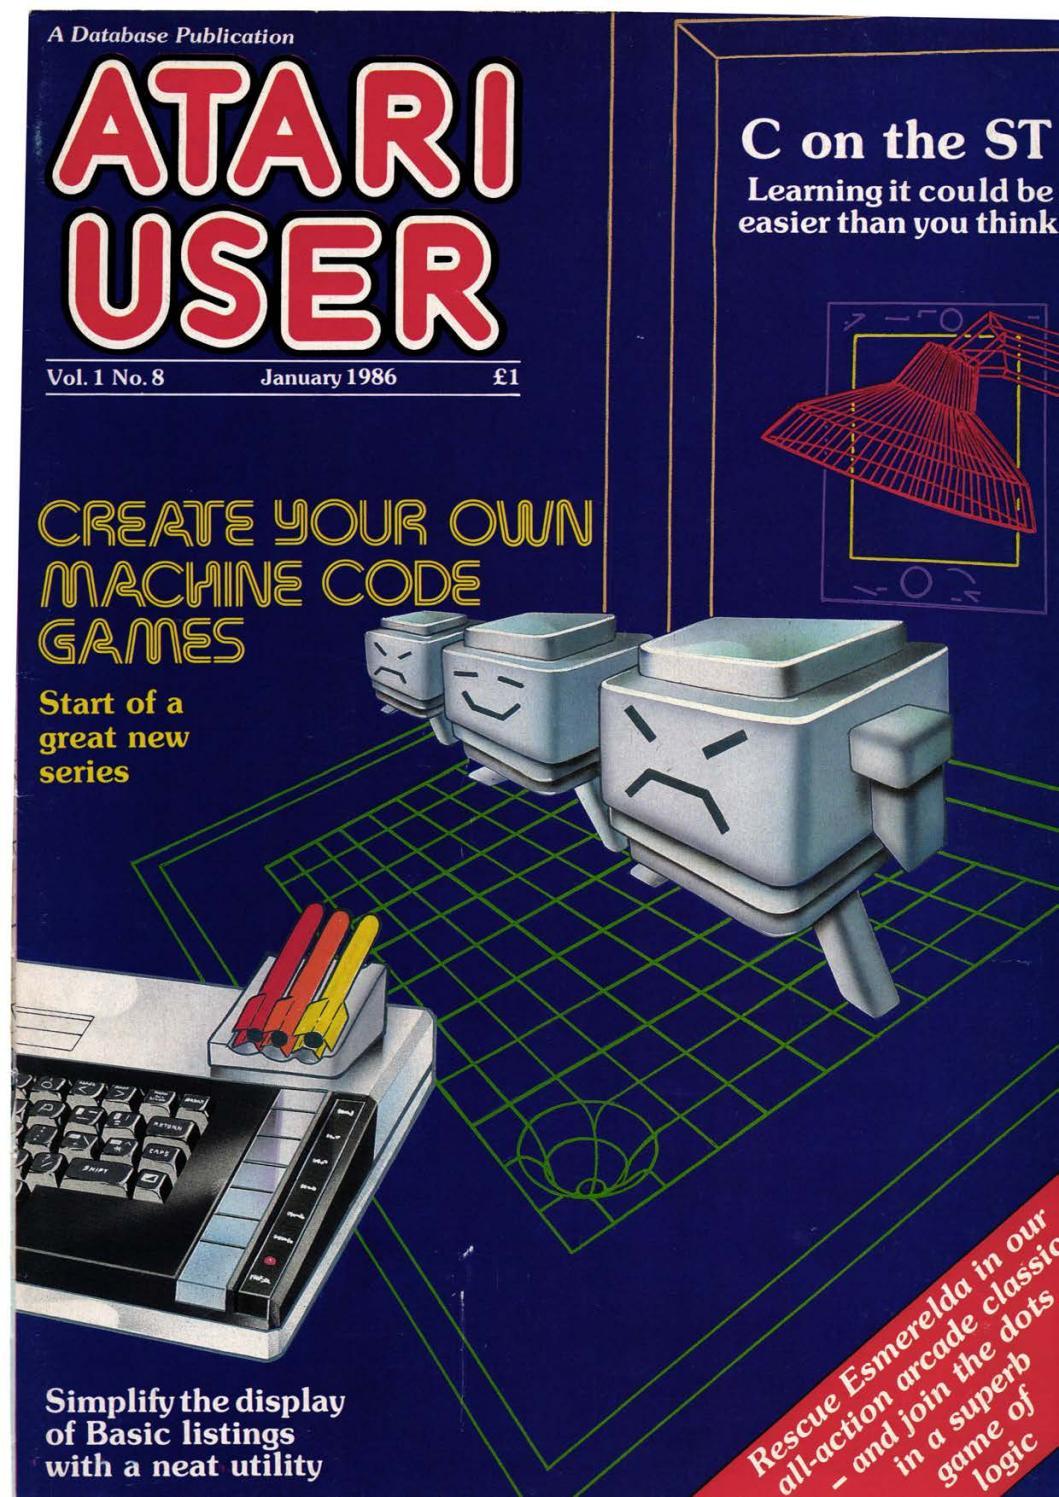 Brand New Amiga Cd The Utilities Experience Volume 1